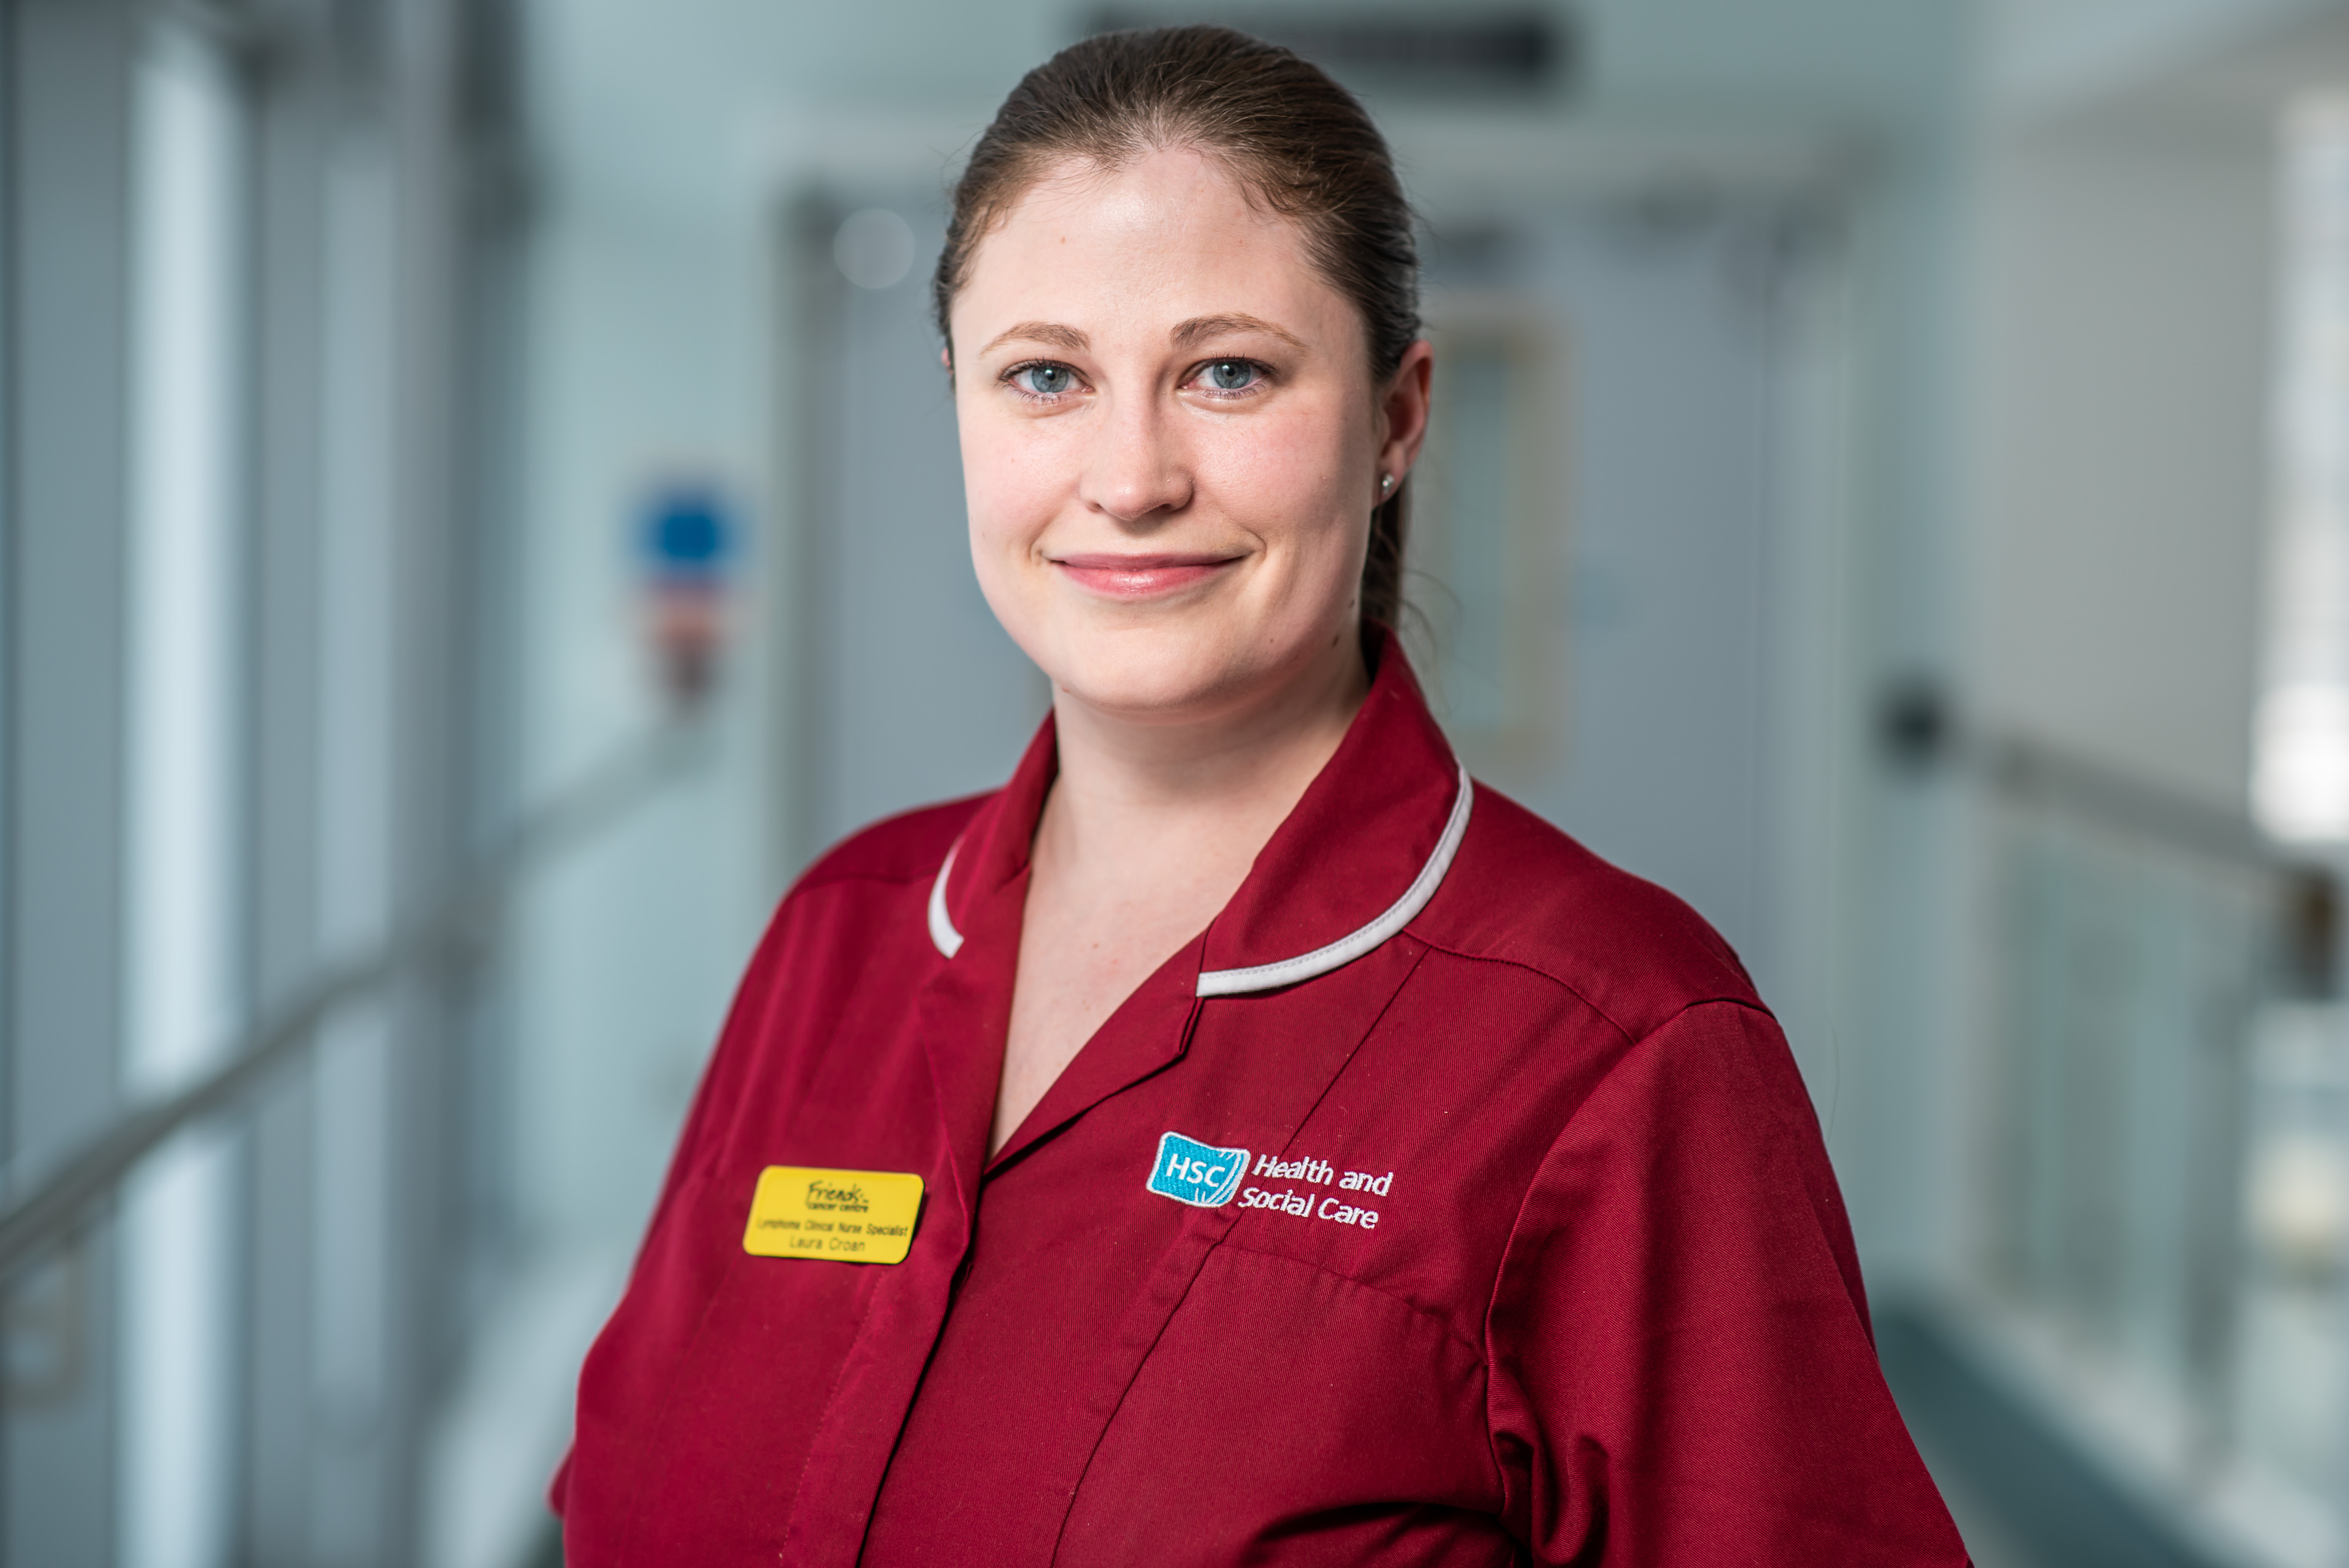 Speaker at Nursing research conferences- Laura Croan